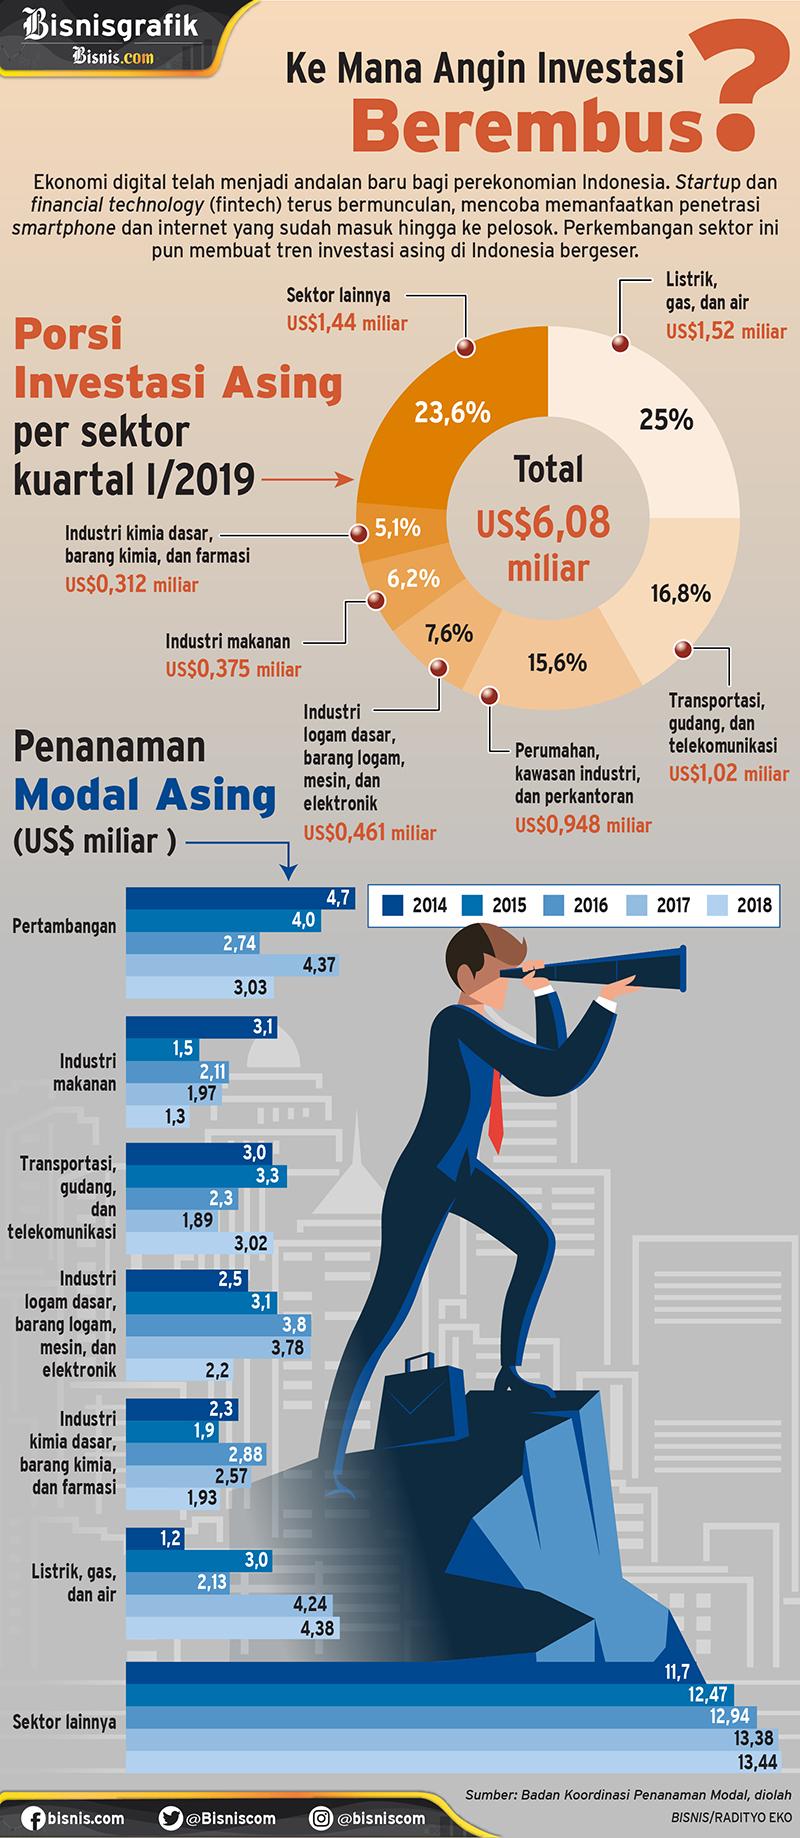 Infografis Bisnis dotcom/Eko